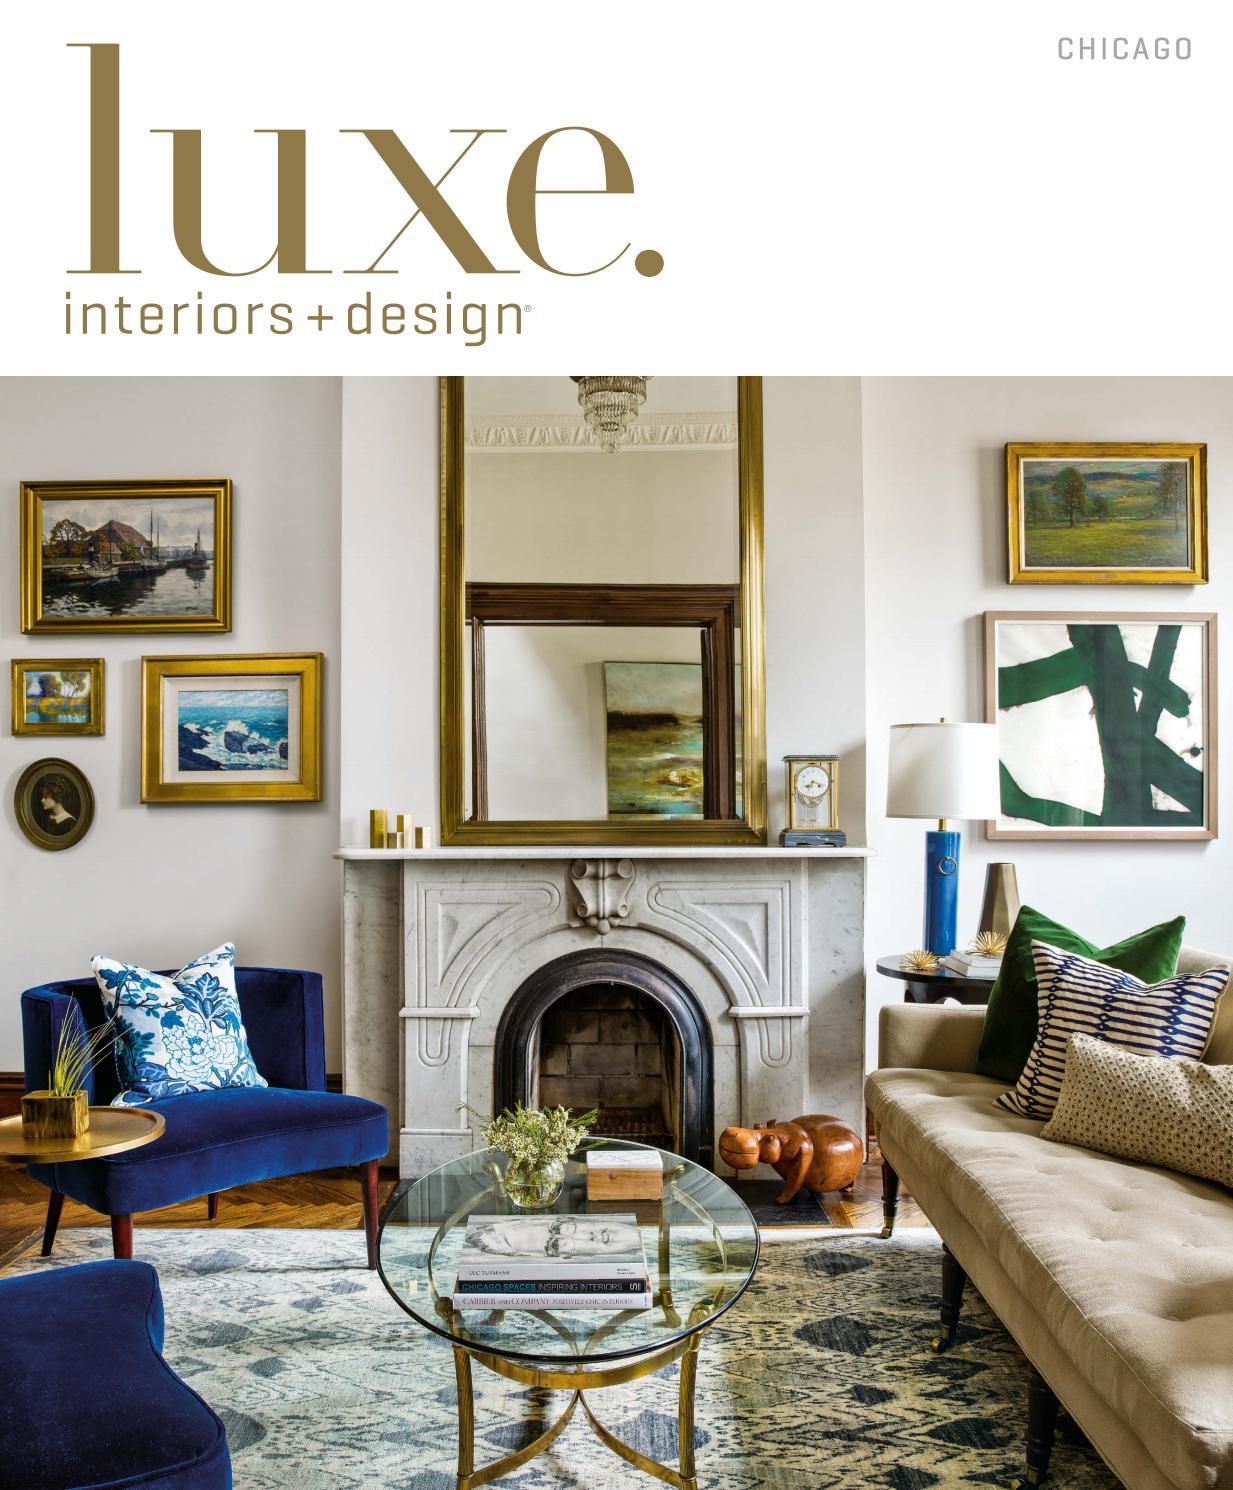 Luxe magazine july 2016 chicago by sandow issuu for International home decor llc